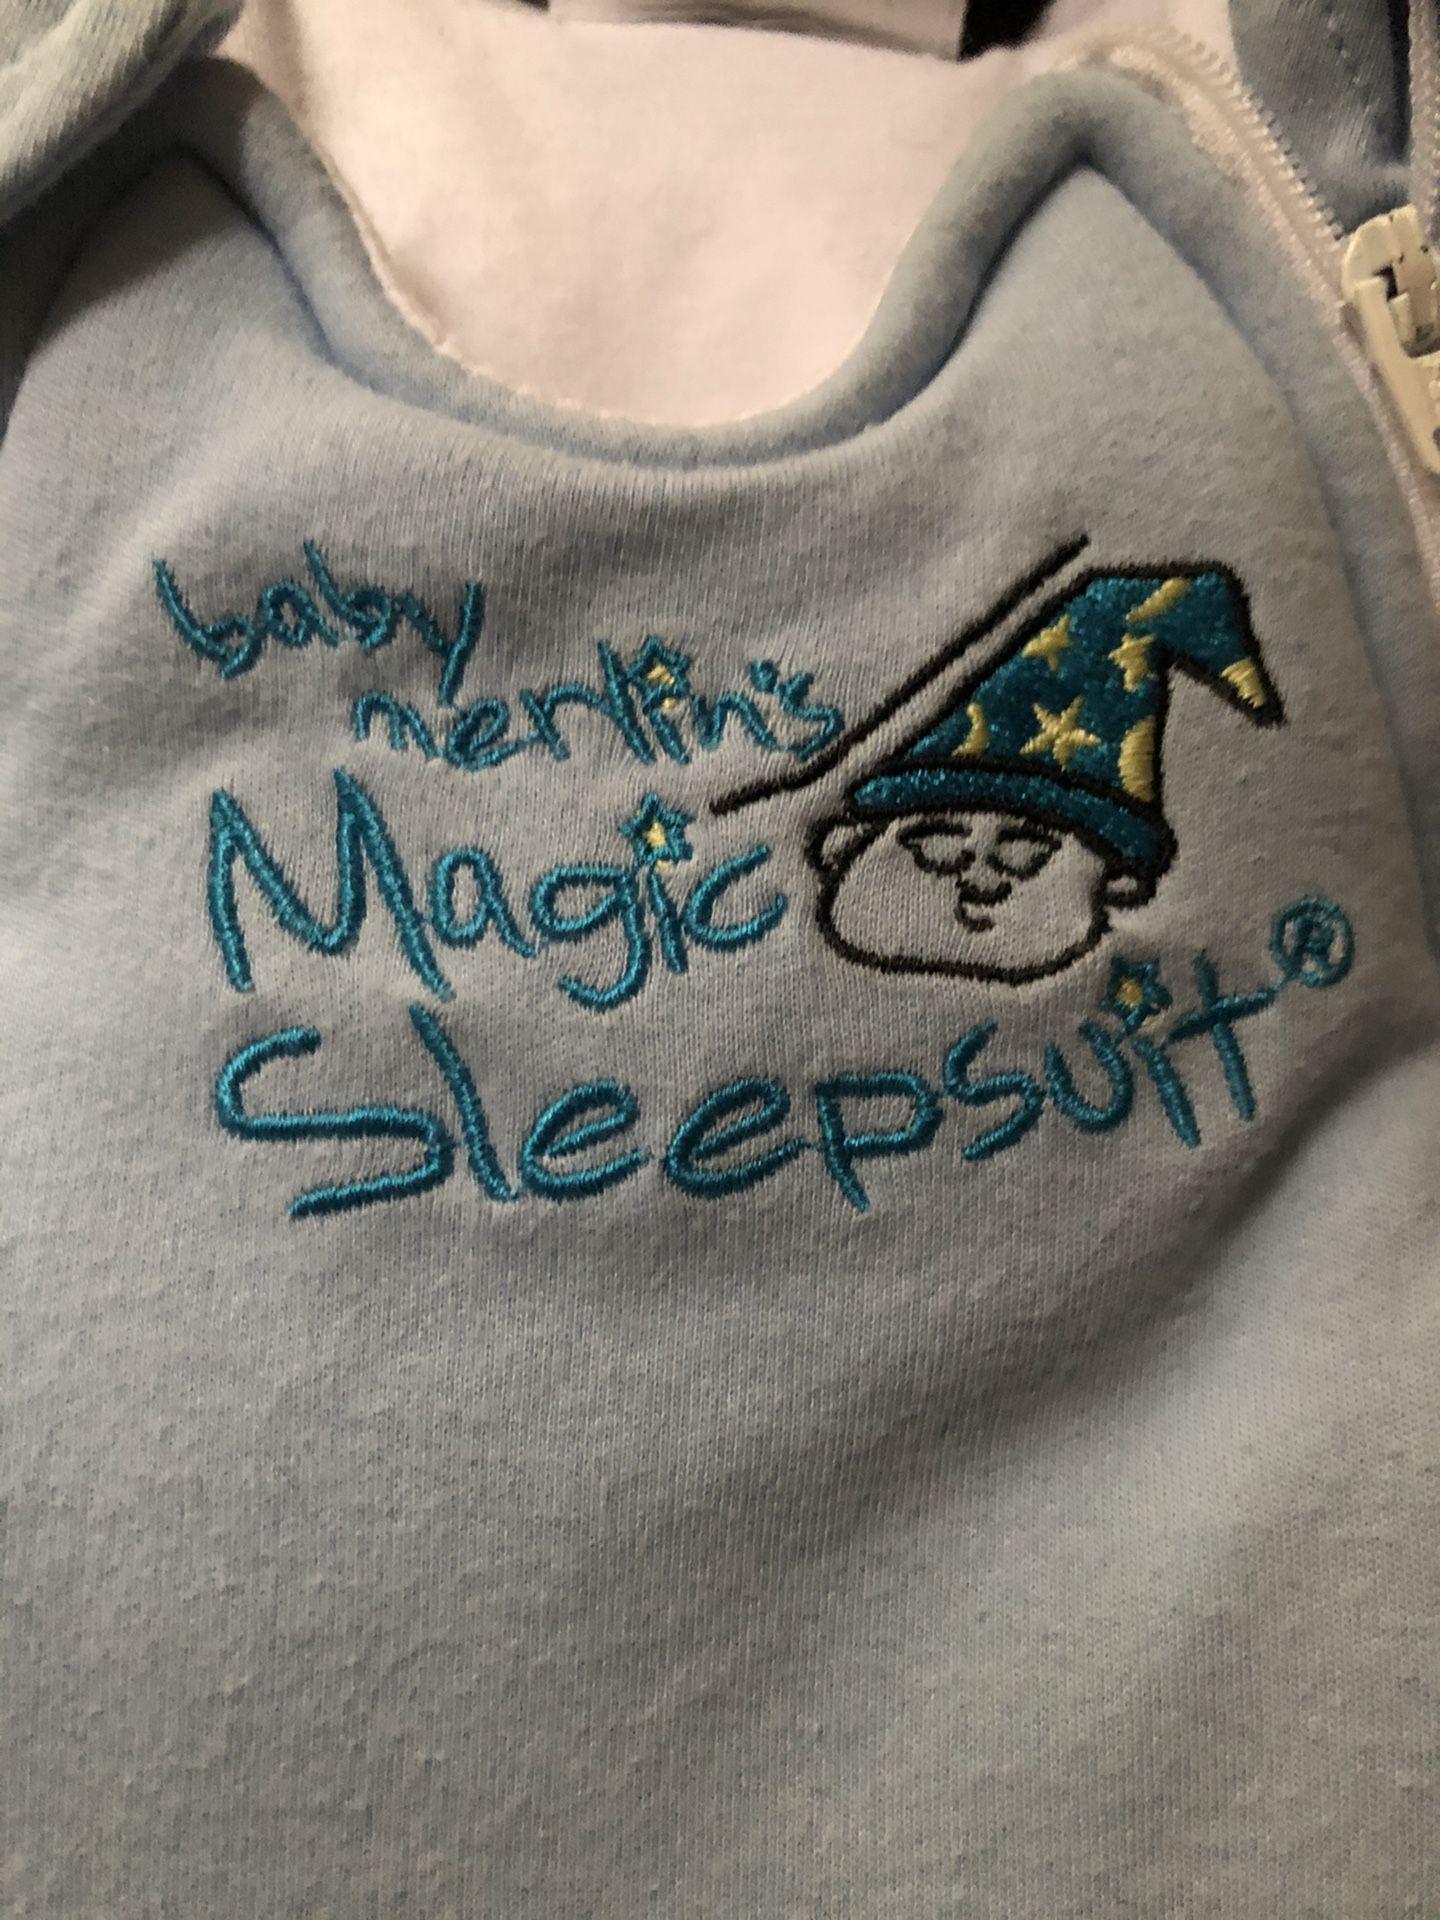 Baby Merlin Sleep Suit For Infants